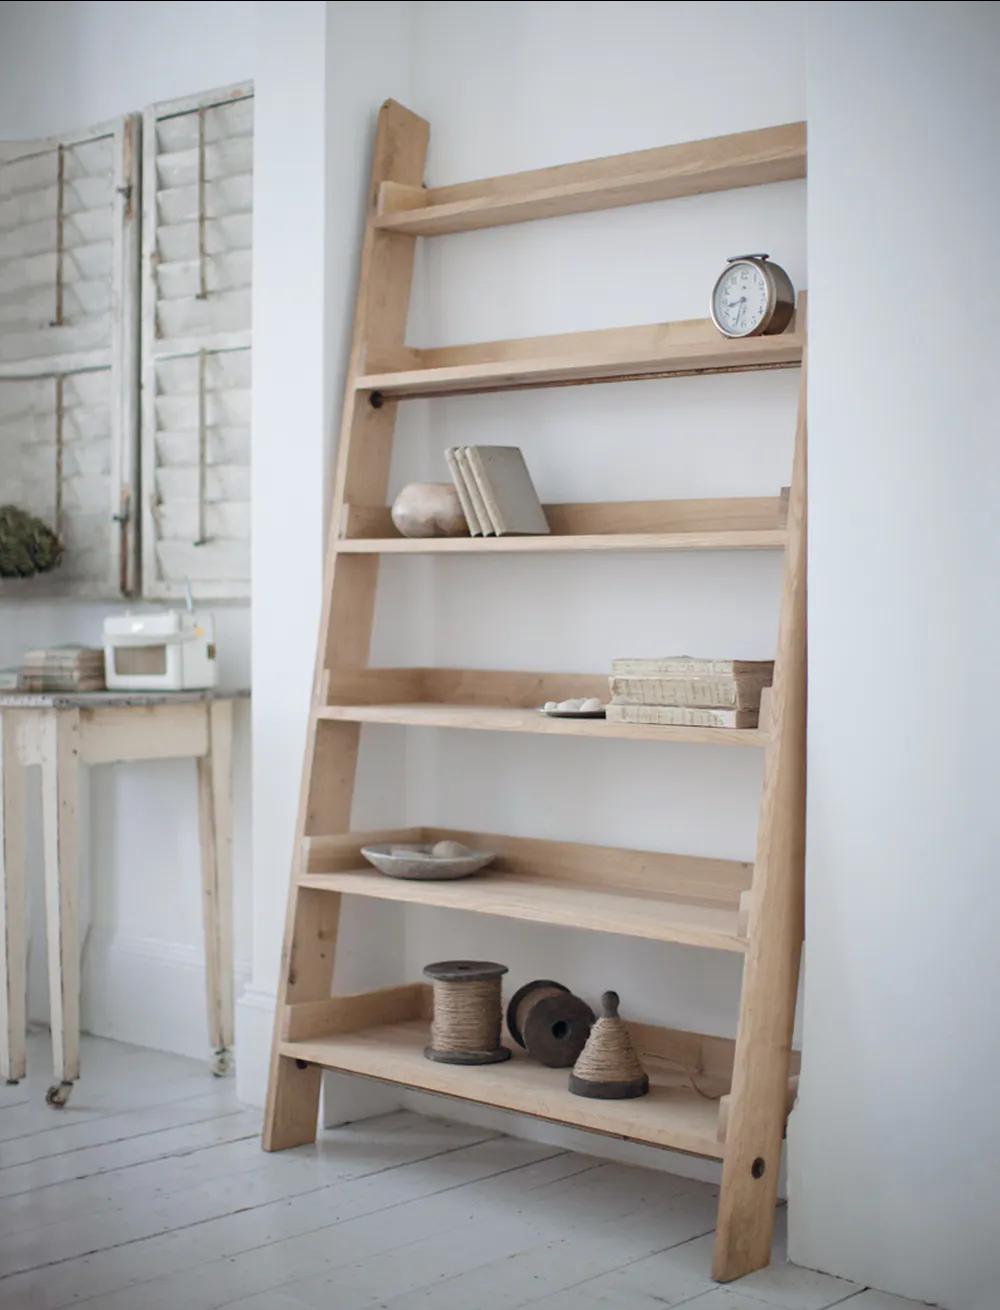 Hambledon Shelf Ladder In 2020 Oak Shelves Shelves Home Furniture